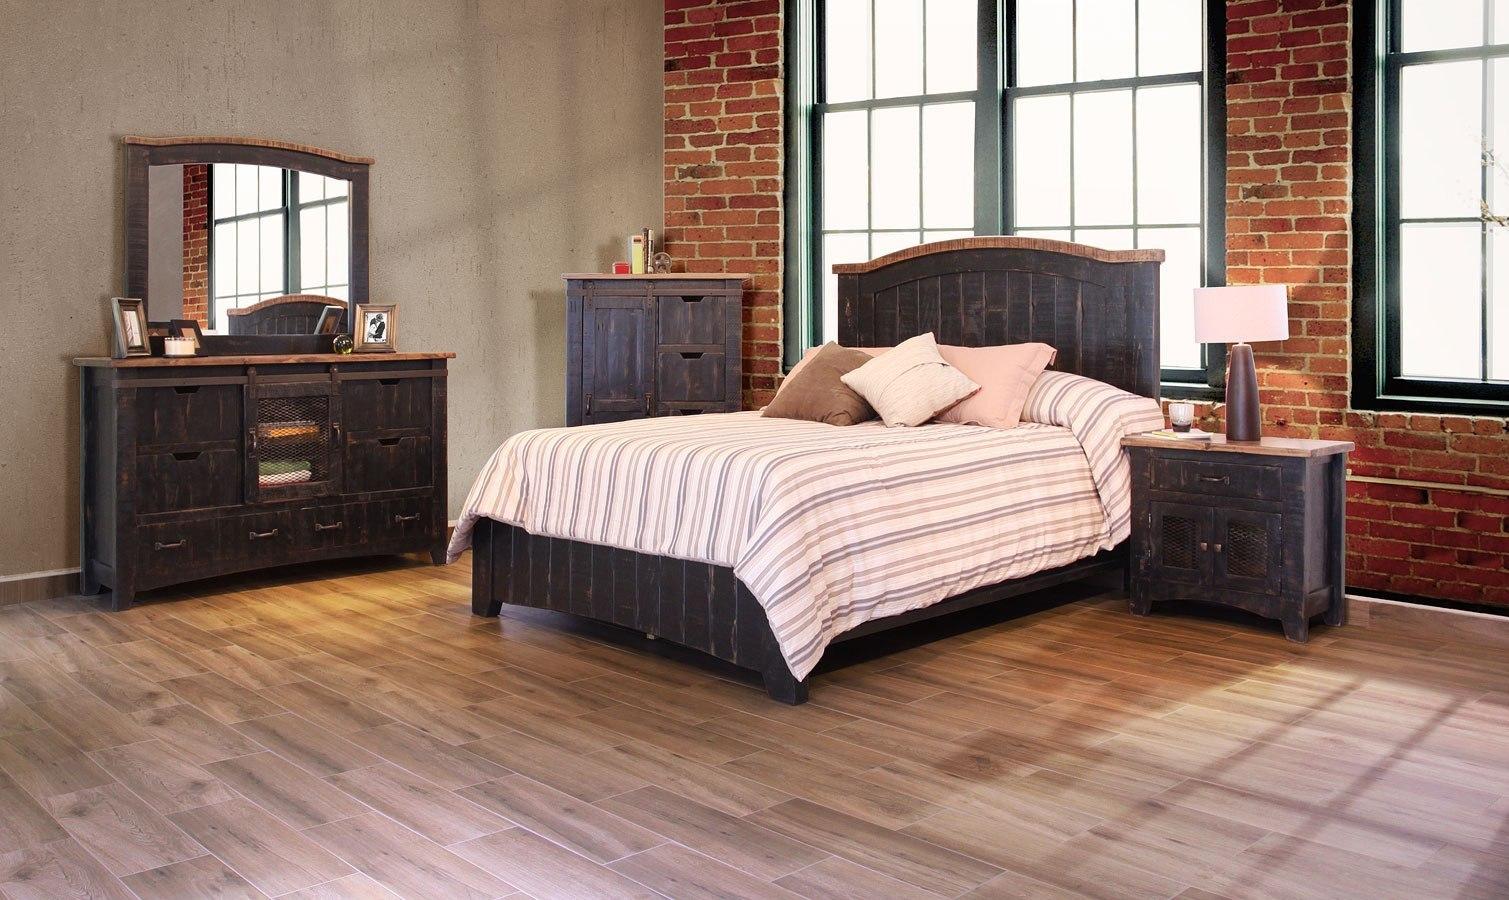 Pueblo Panel Bedroom Set (Black) by IFD Furniture | FurniturePick